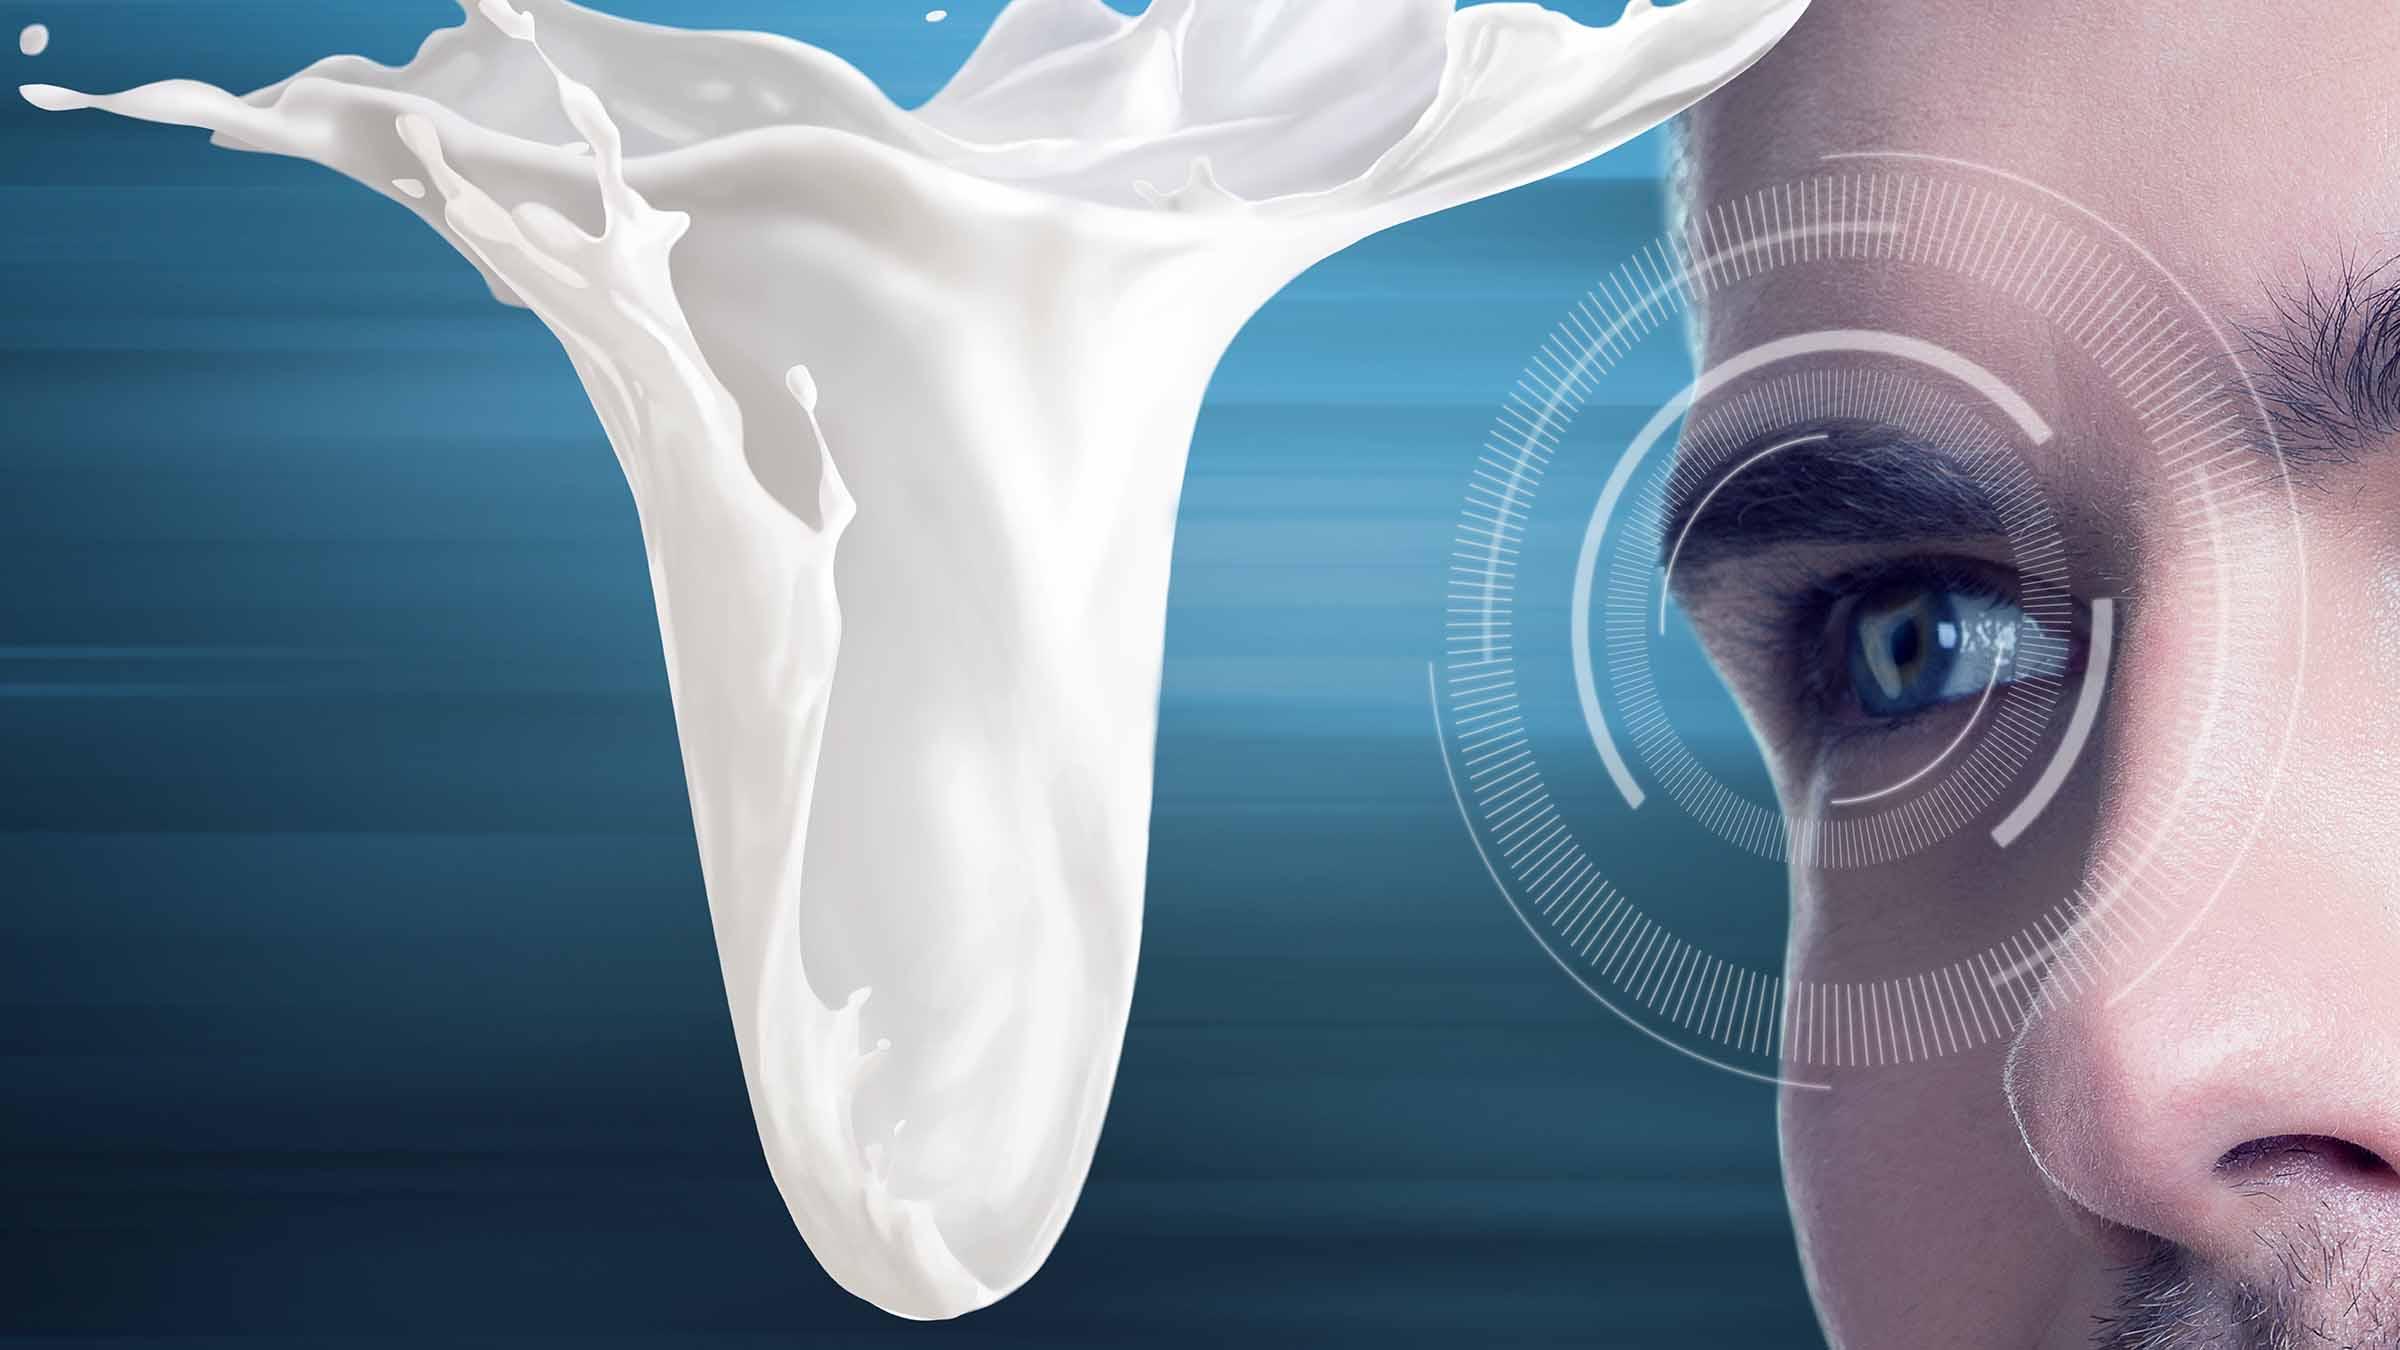 https://www.centroveterinariosanmartino.it/wp-content/uploads/2019/03/gea-dairymilk-M6850-cell-count-sensor-milk-drop-eye-poster_tcm11-48250.jpg